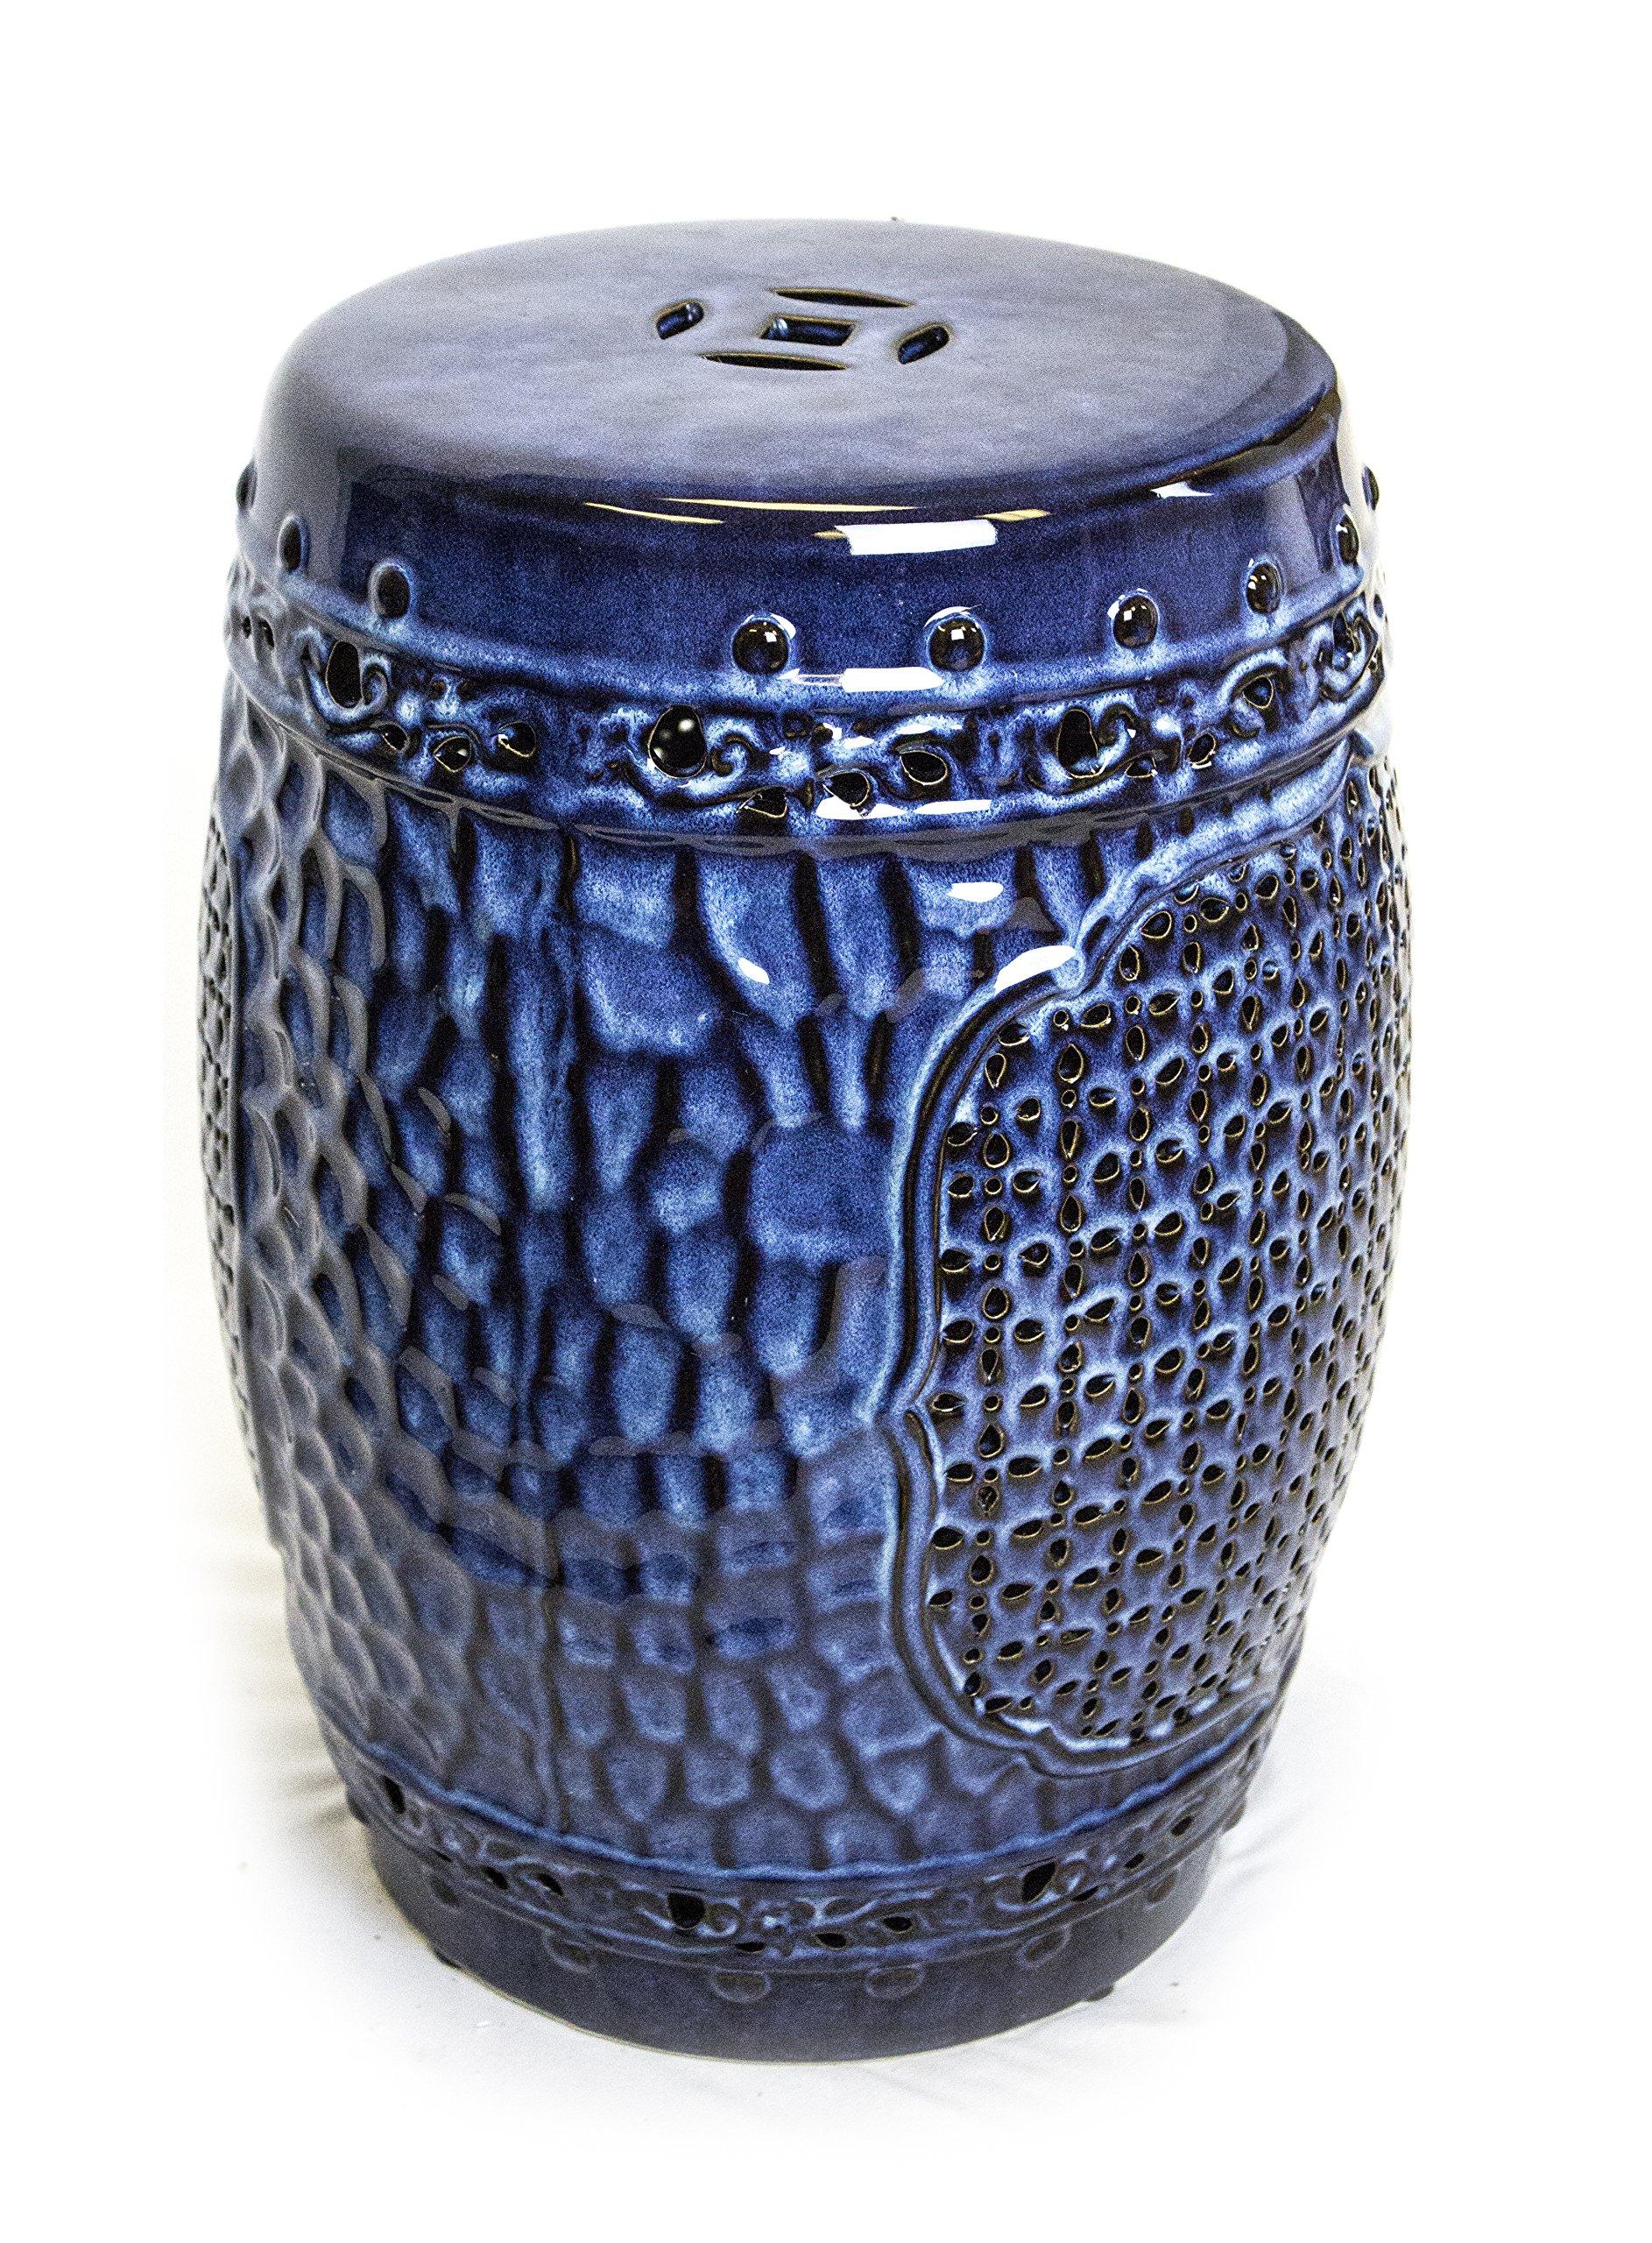 Sagebrook Home FC10456-01 Pierced Garden Stool Reactive Blue Ceramic, 13.75 x 13.75 x 17.5 Inches